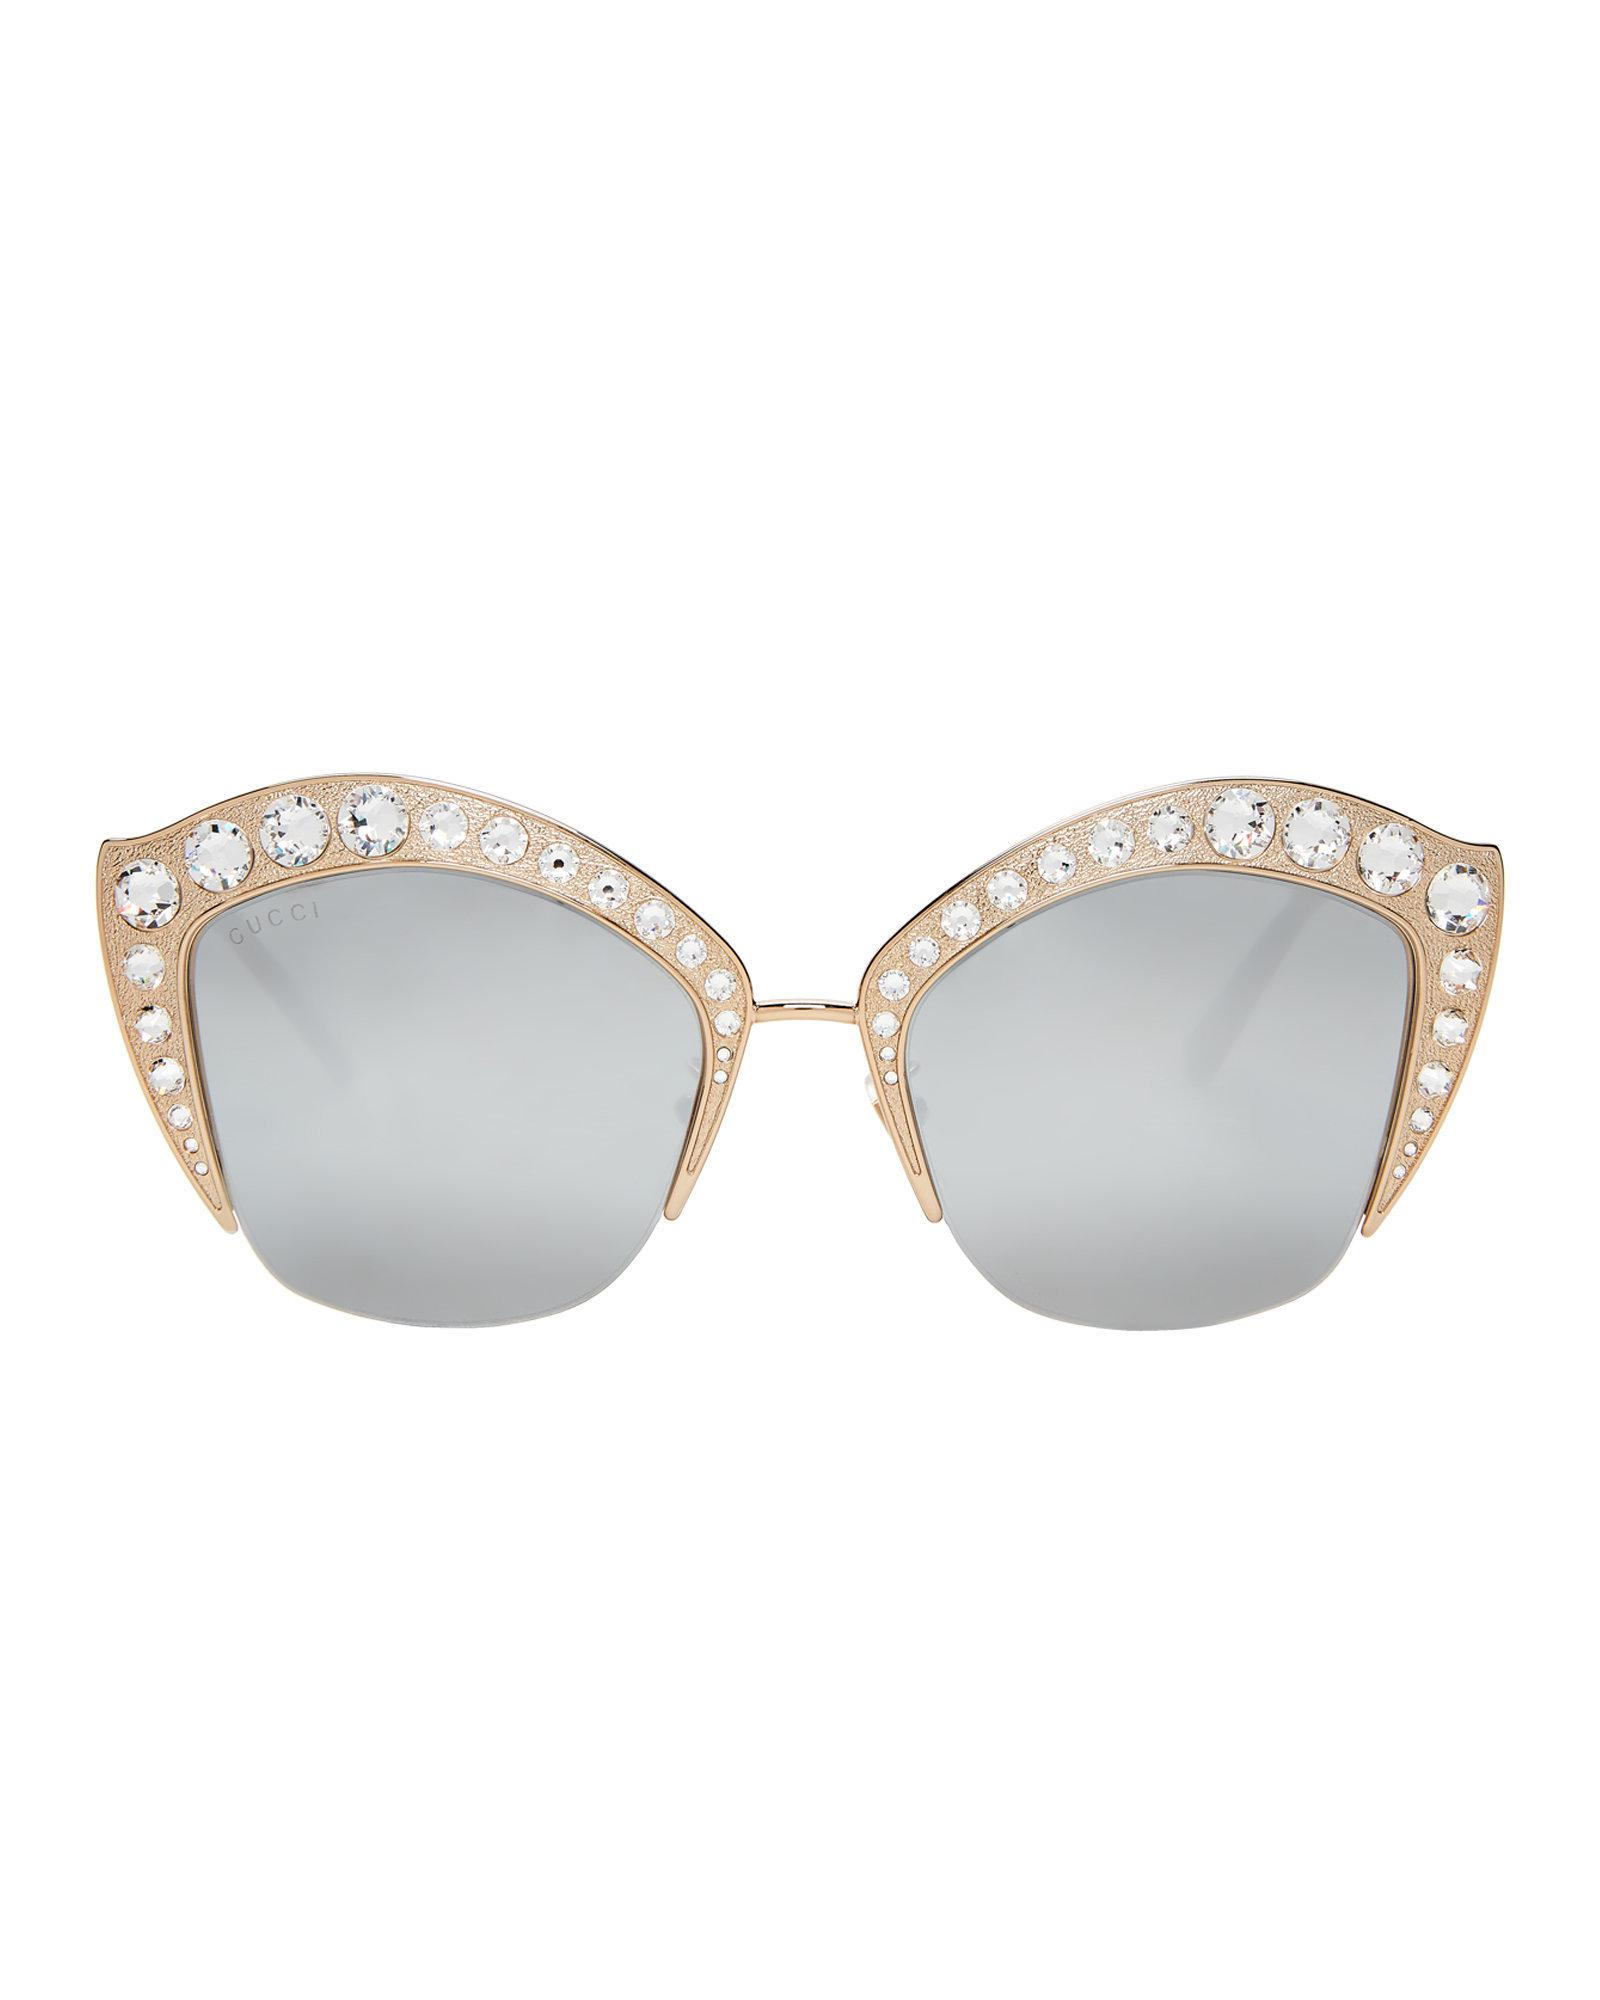 e3715db8b6976 Gucci GG 0114 s Gold-tone Cat Eye Sunglasses in Metallic - Lyst